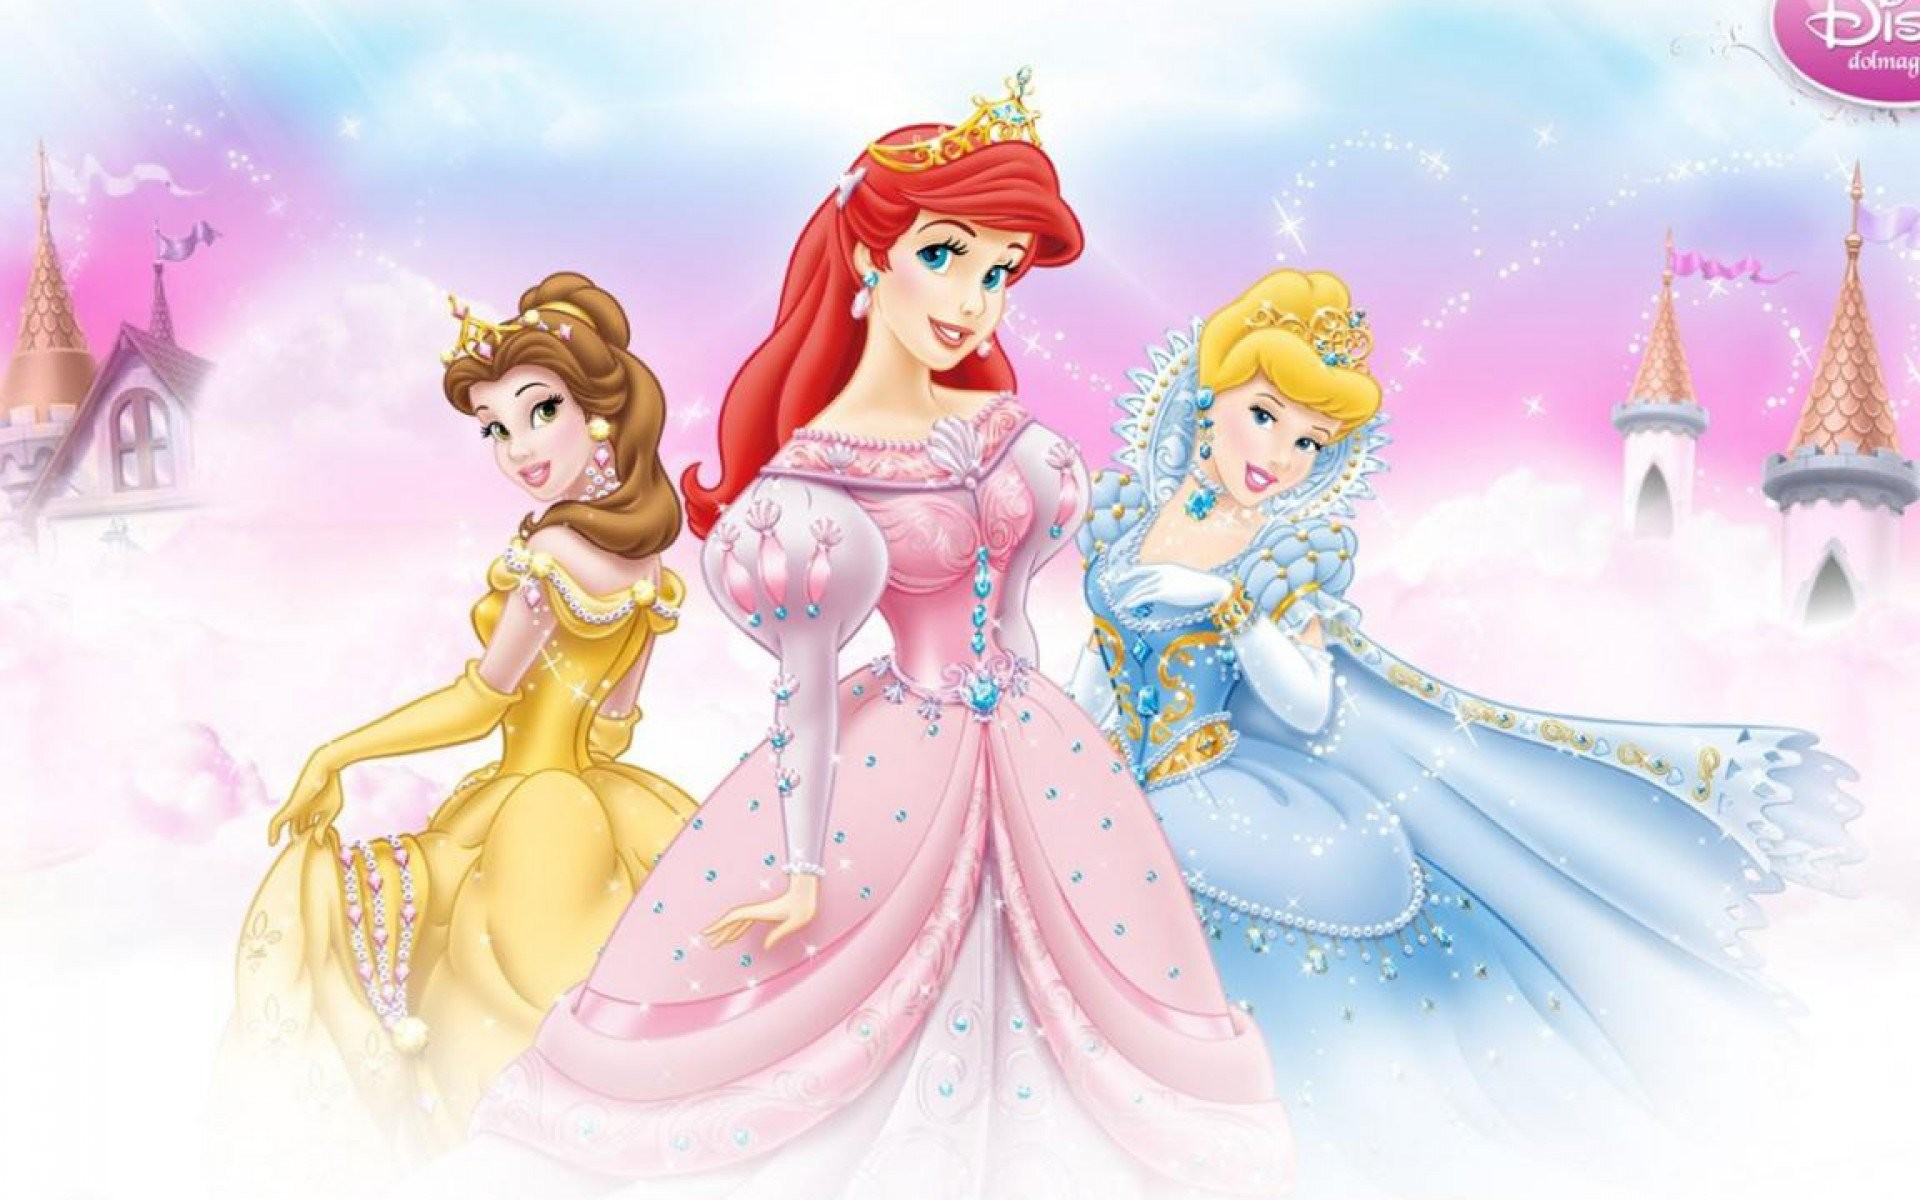 Princess Disney Wallpaper ·① WallpaperTag